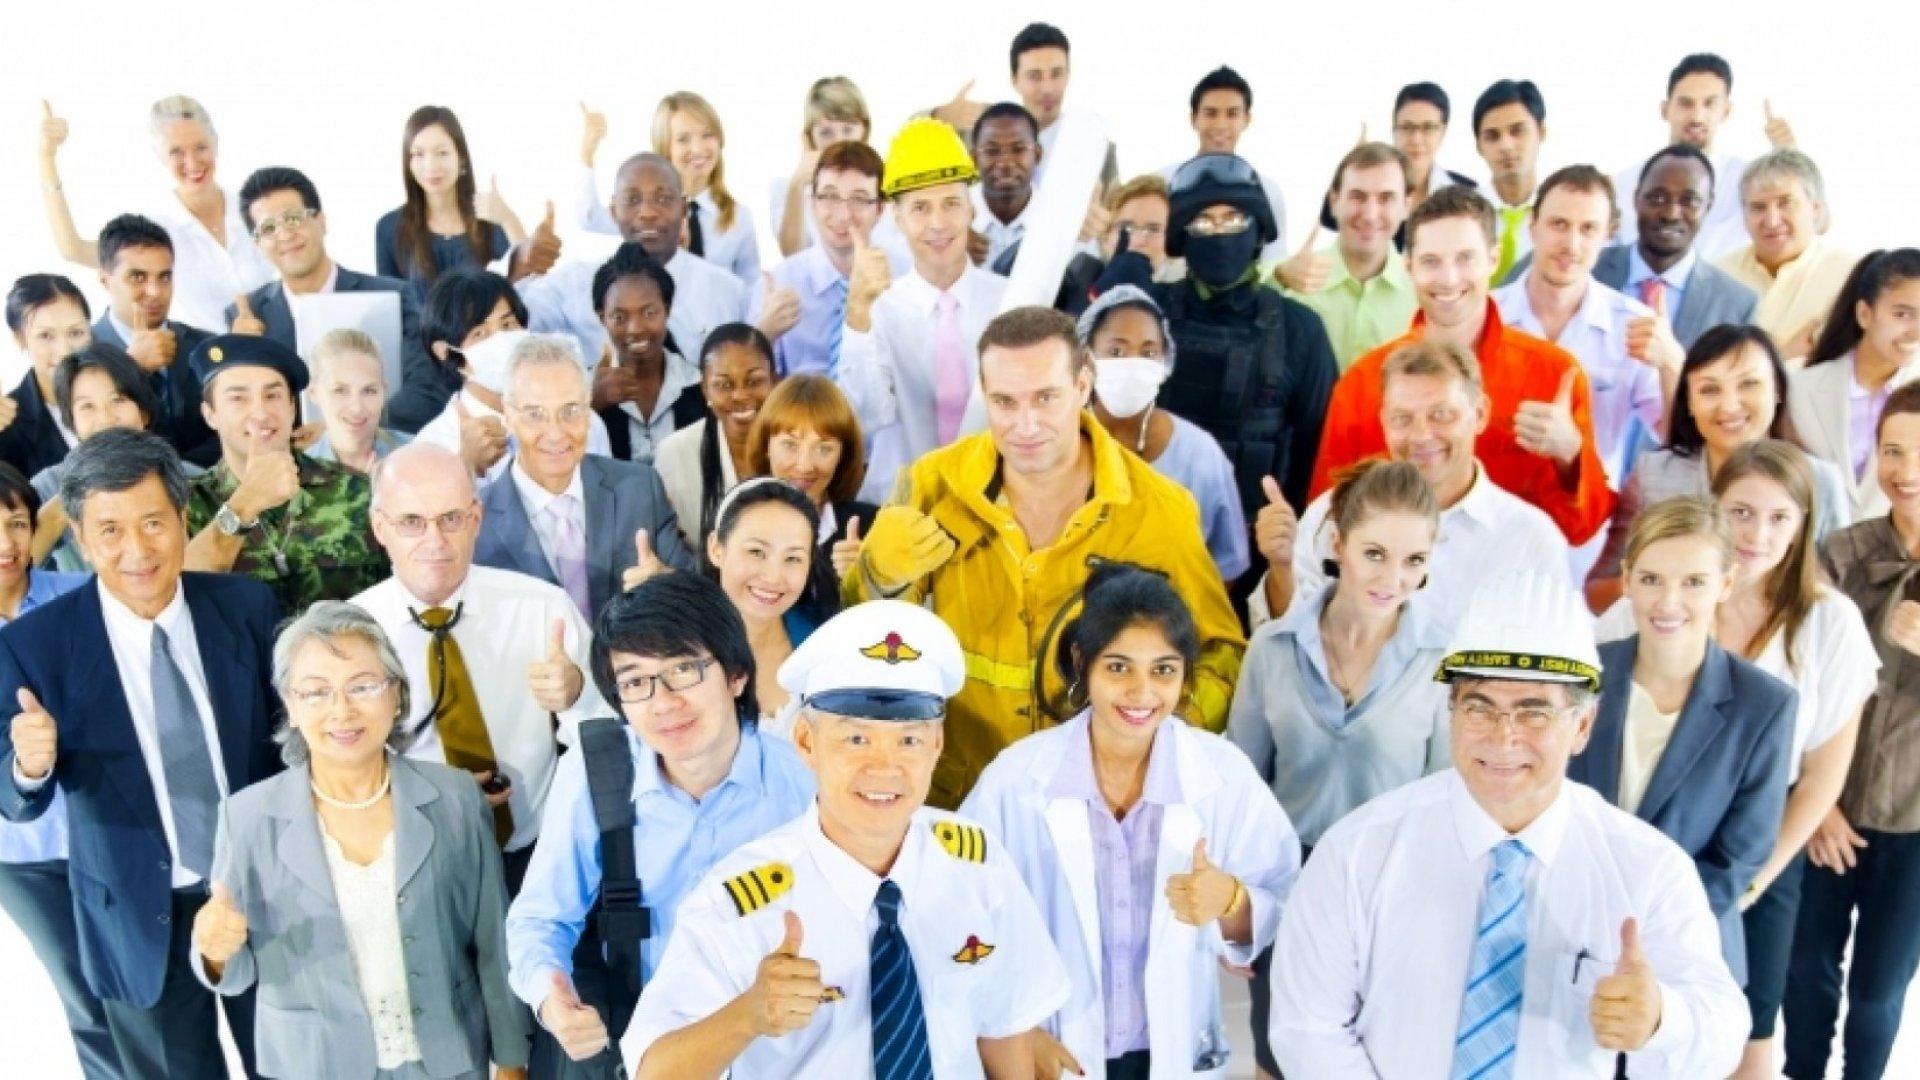 6 Ways to Improve Employee Wellness